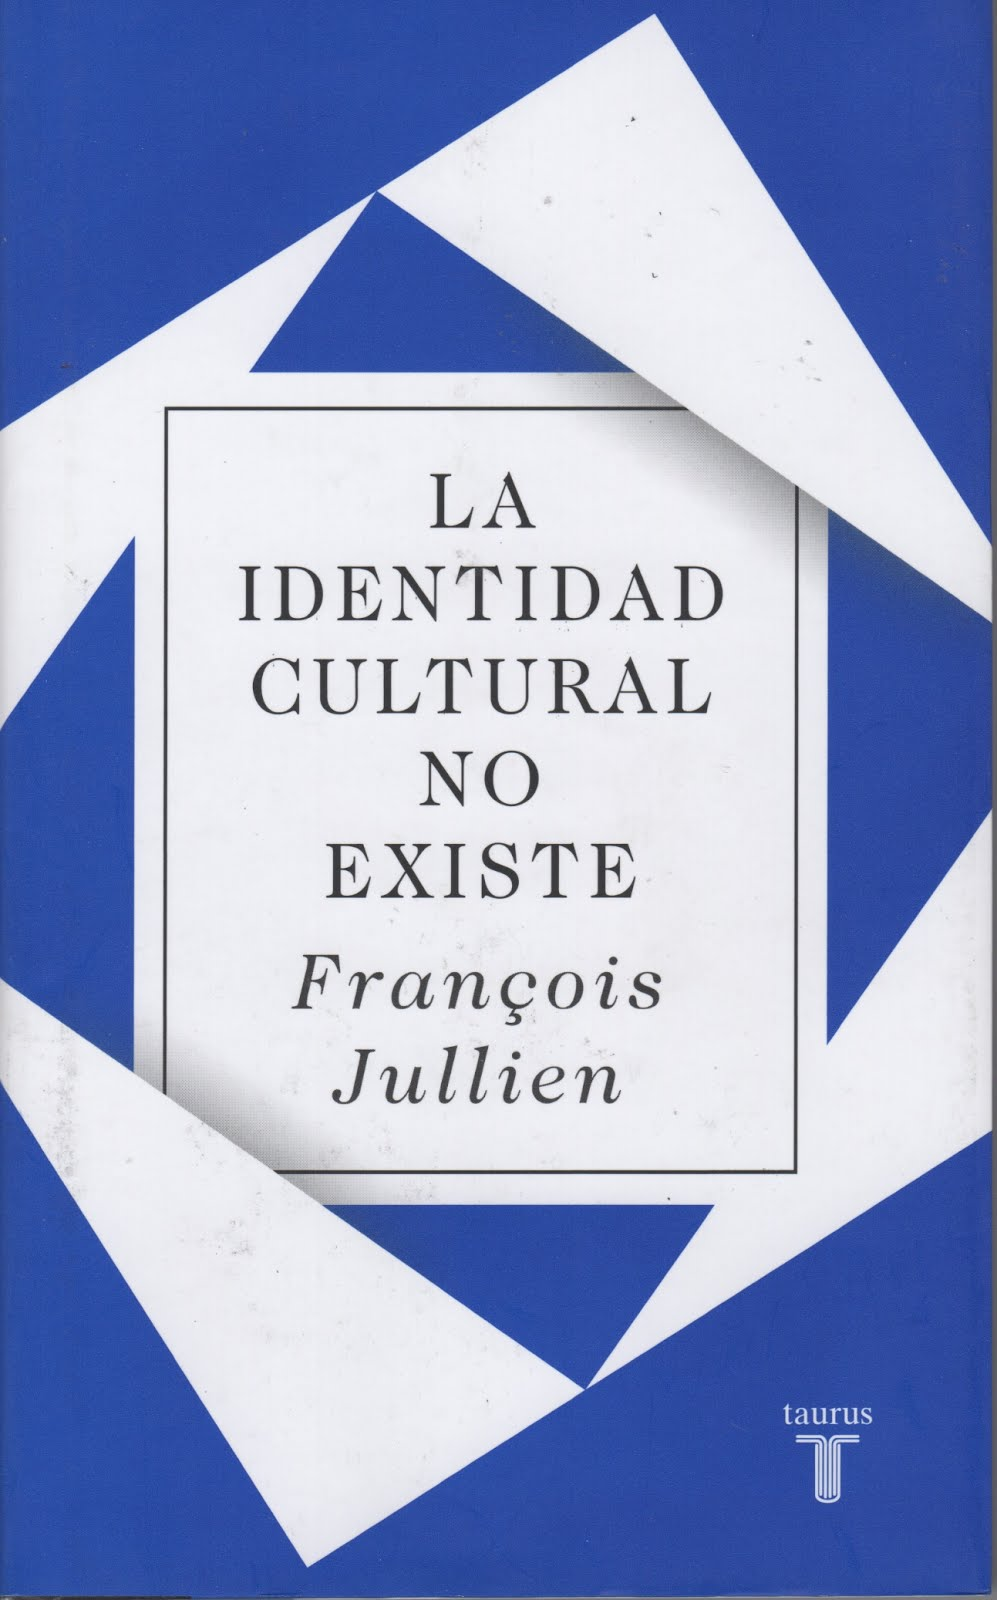 François Jullien (La identidad cultural no existe)